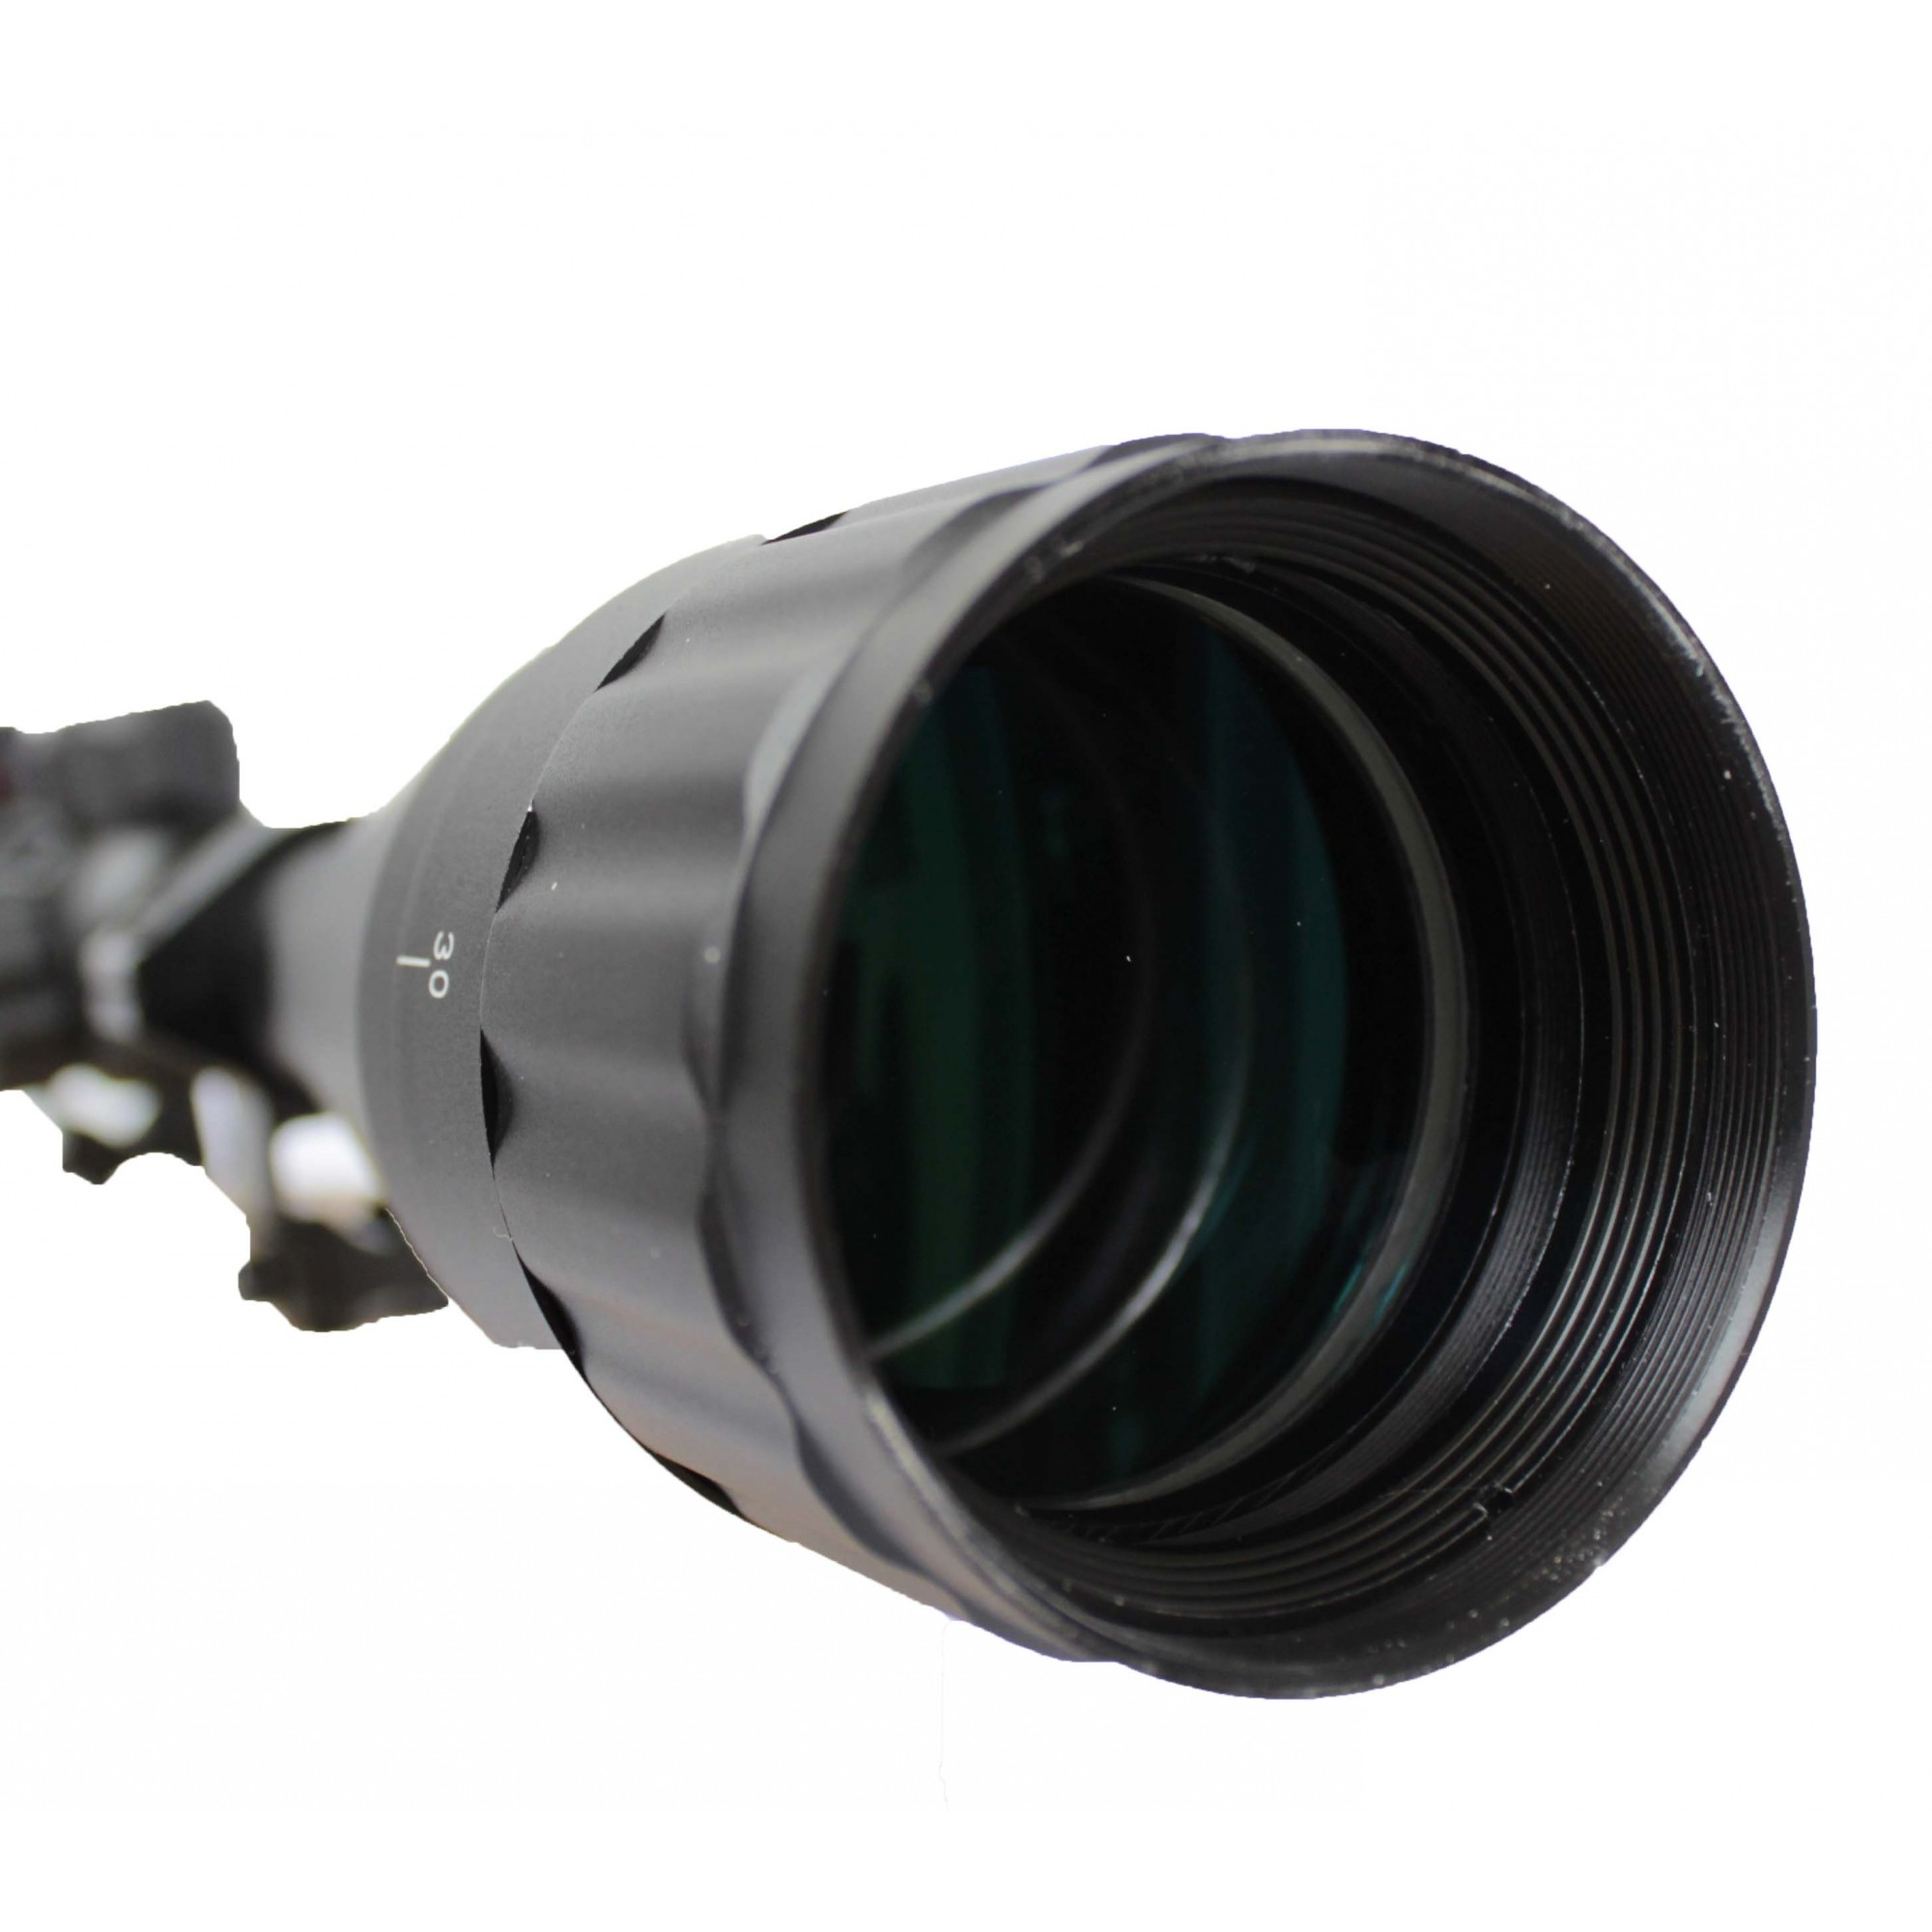 Luneta 6-24x50 AOE FXR Ajuste Parallax Suporte Mount 11mm